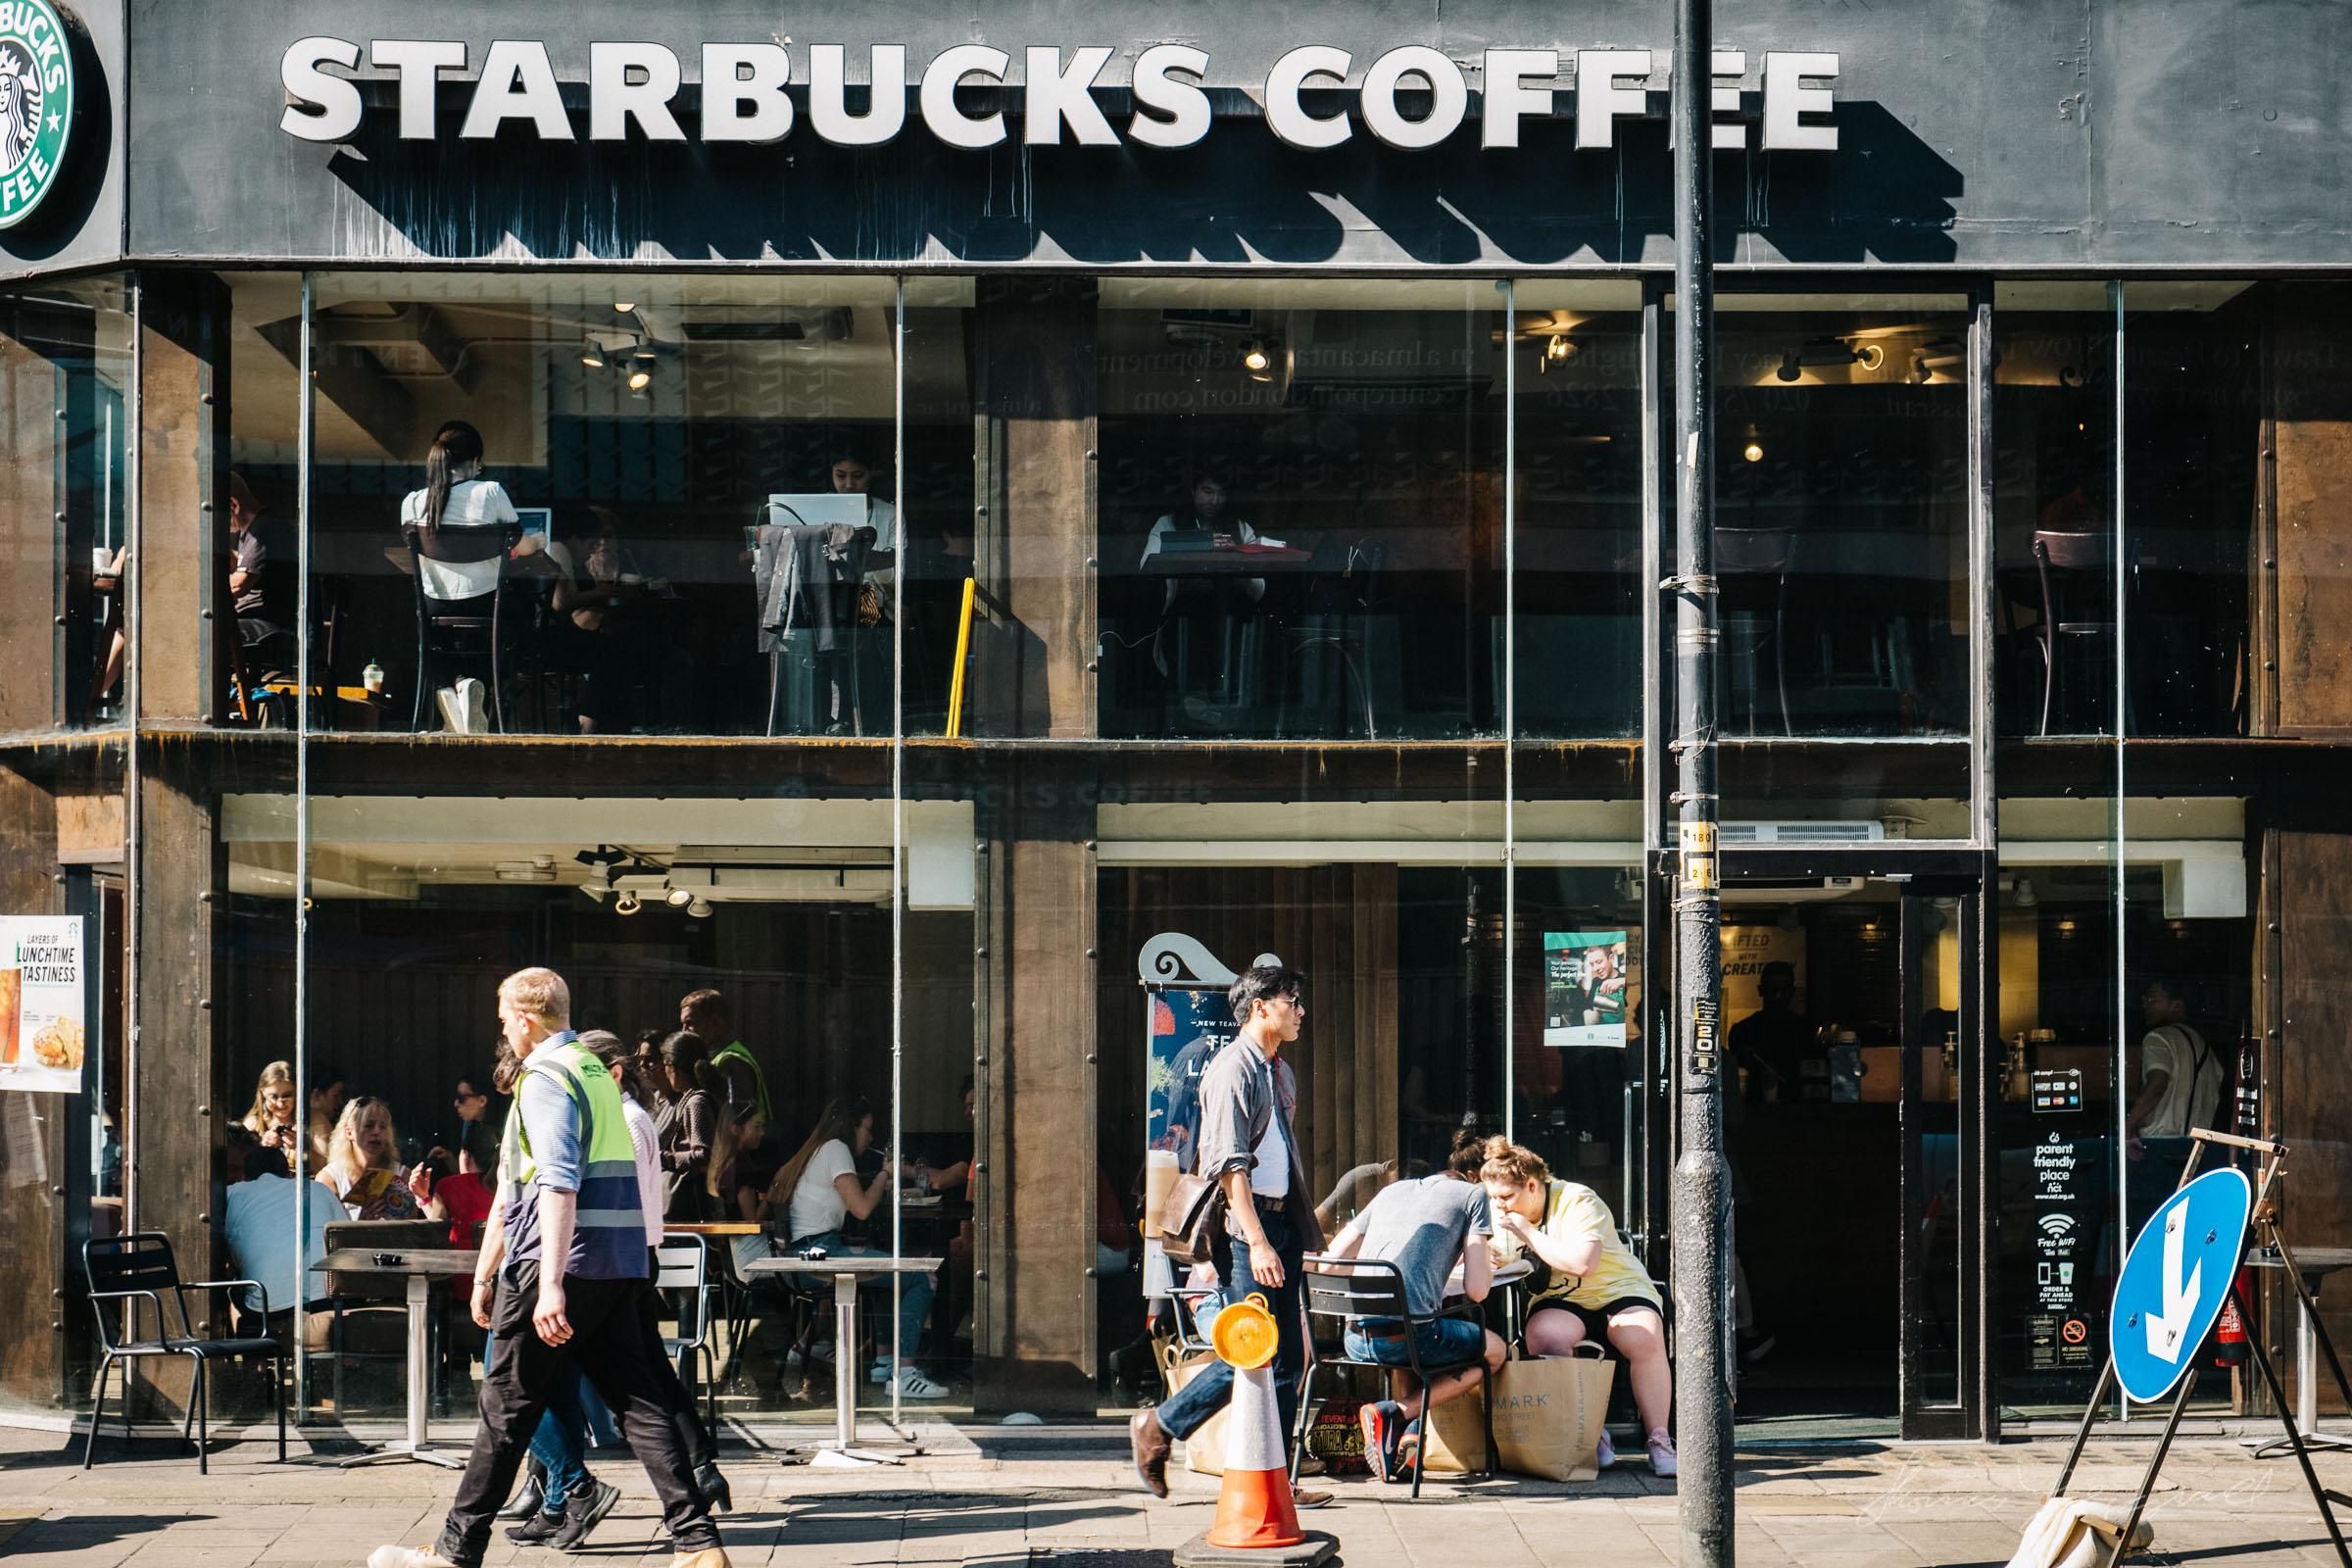 A busy Starbucks in London